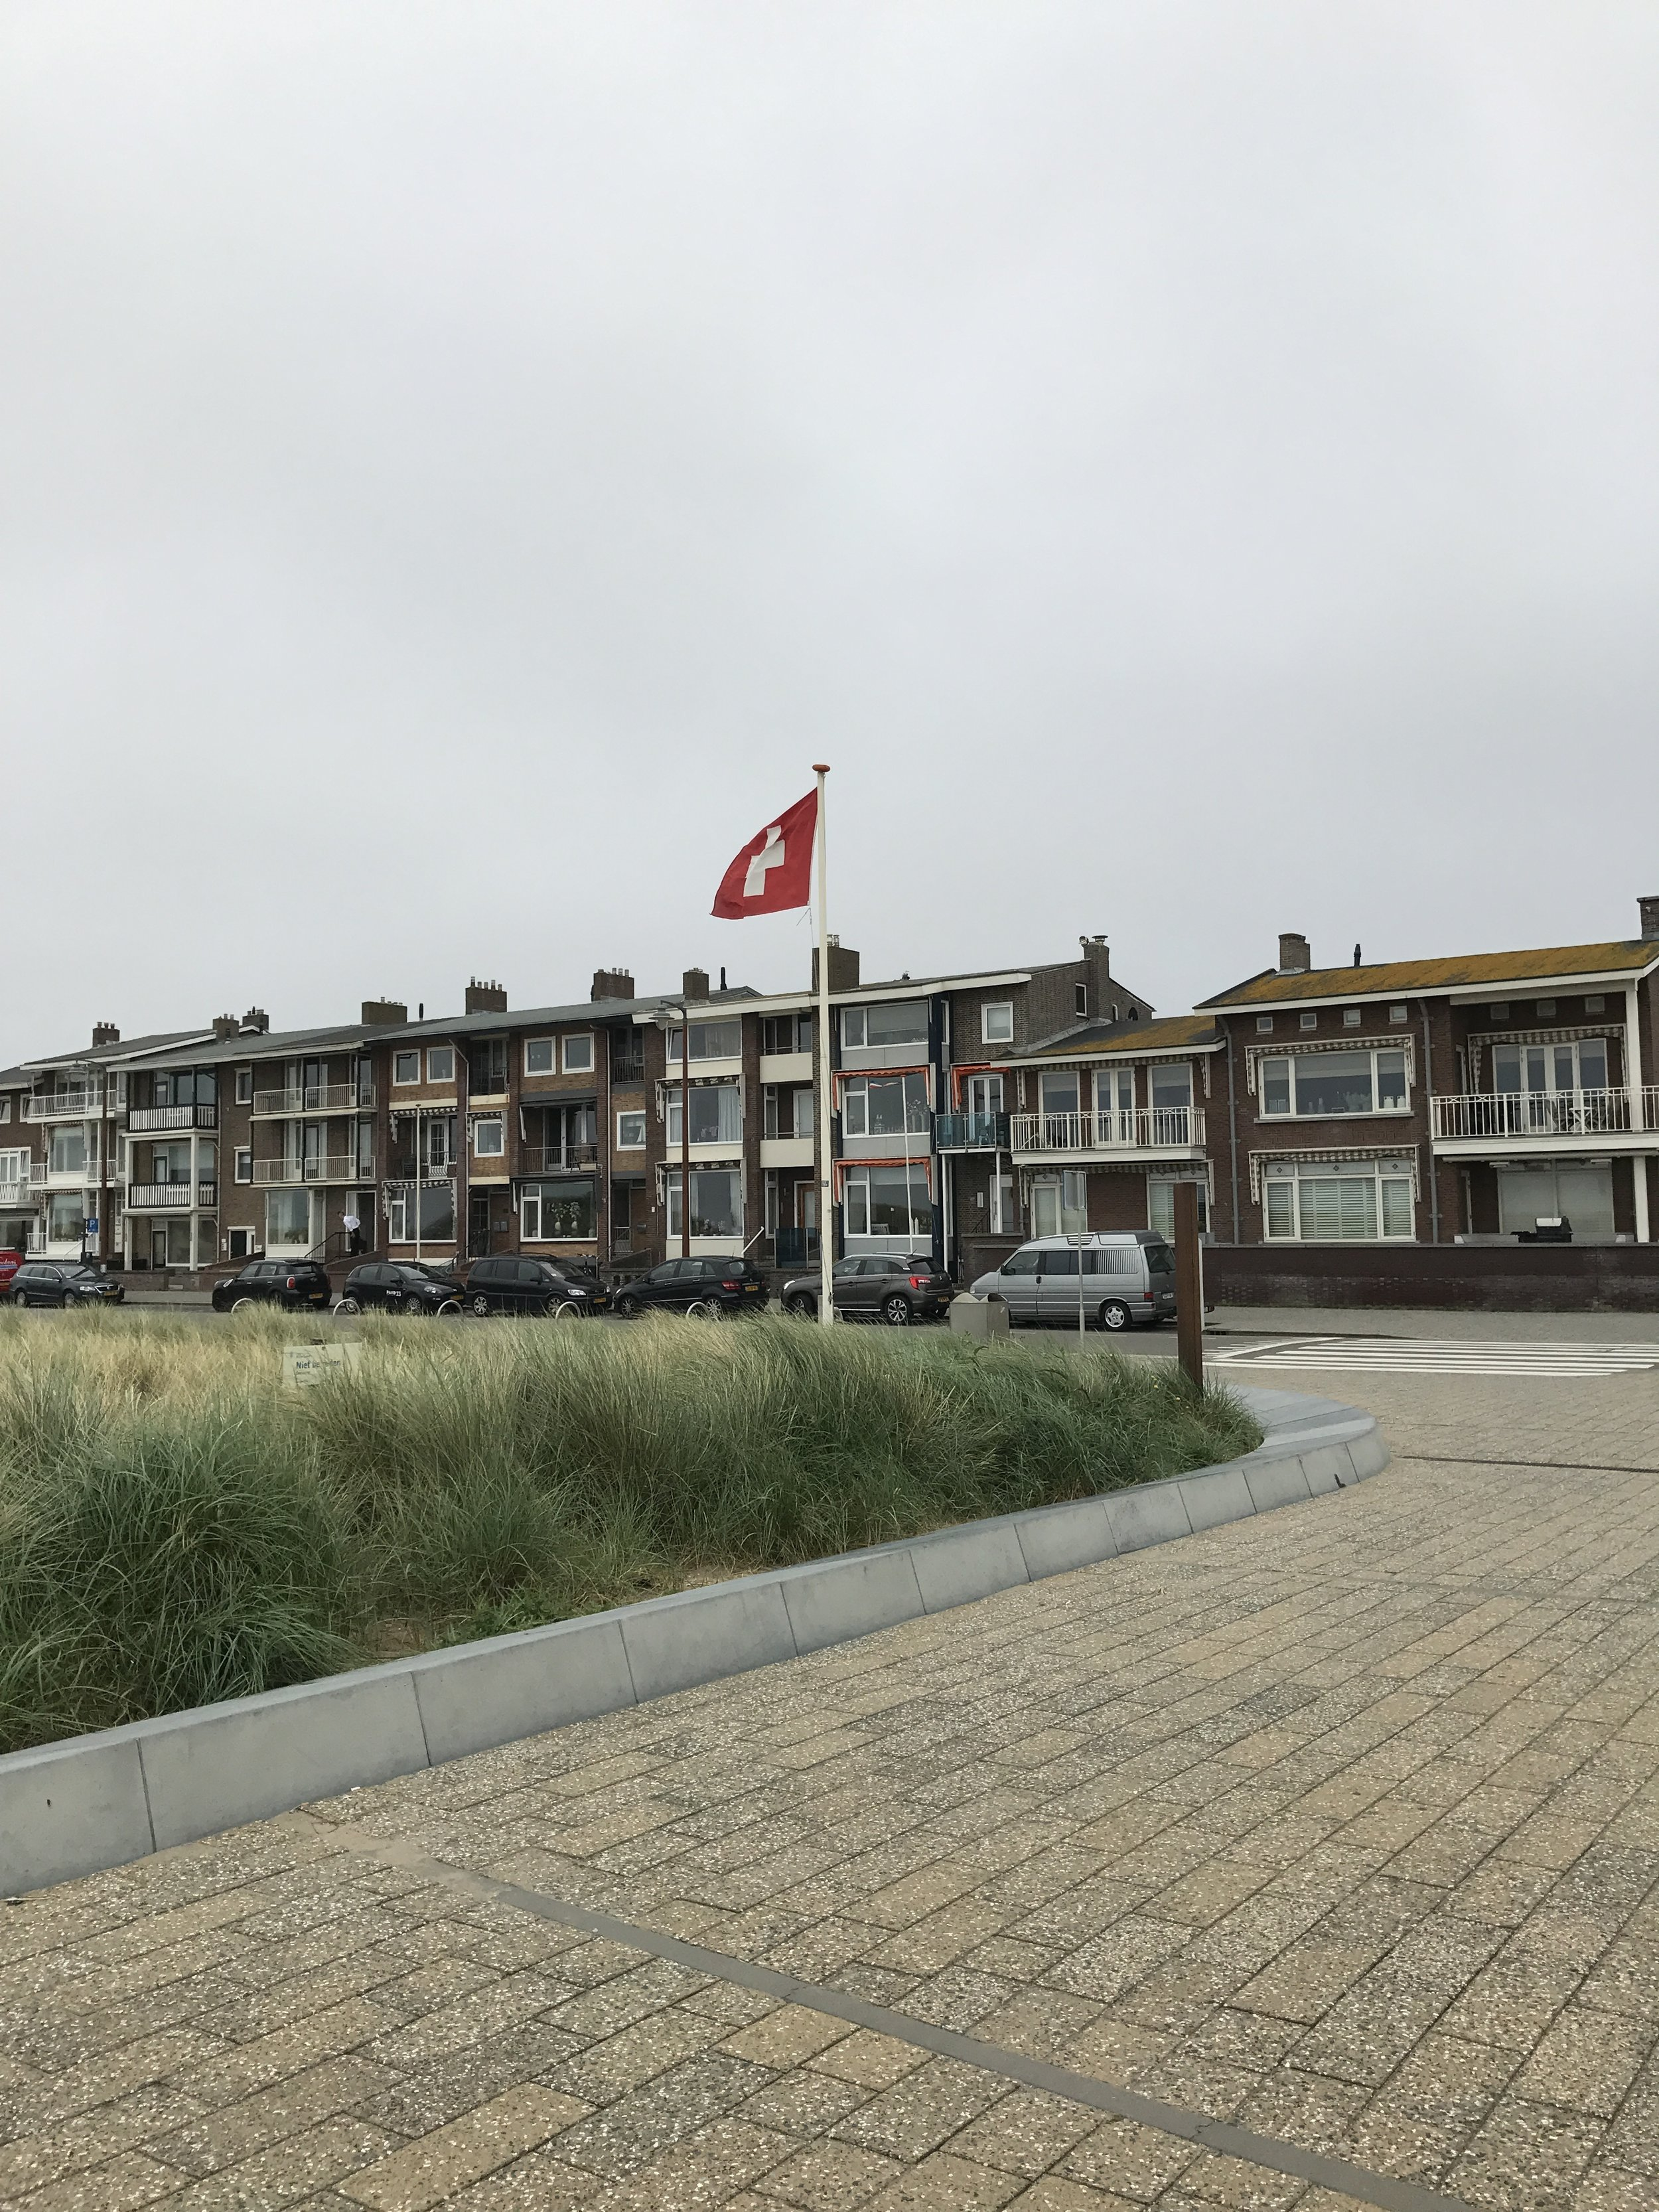 Arriving at the township of Katwijk-aan-Zee.